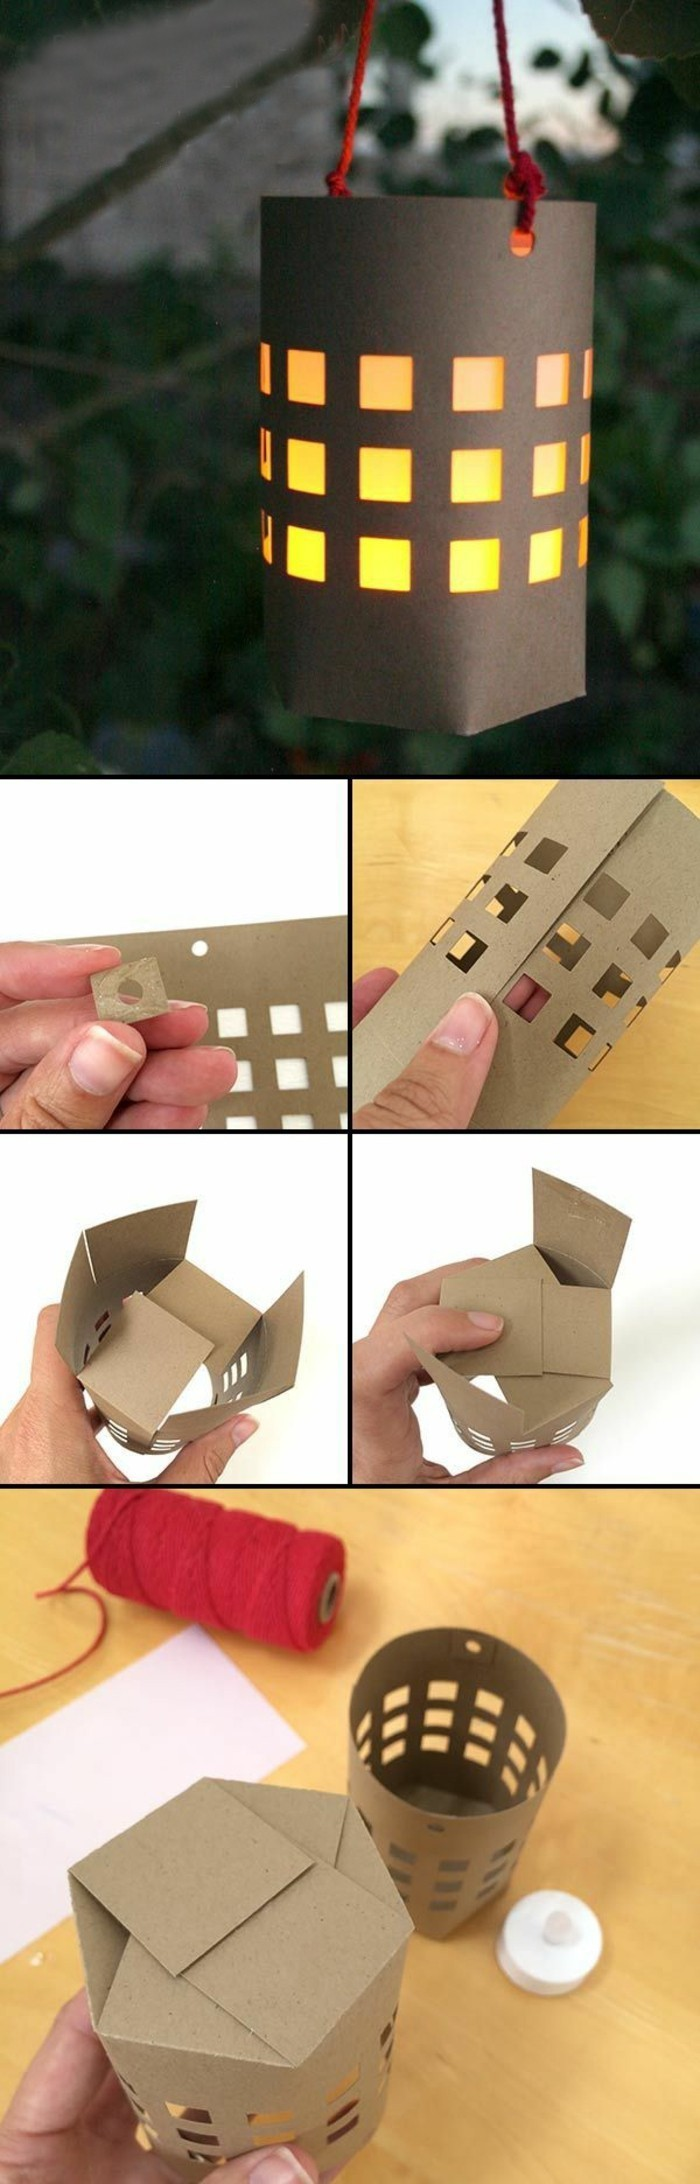 laterne-selber-basteln-papierlaterne ideen